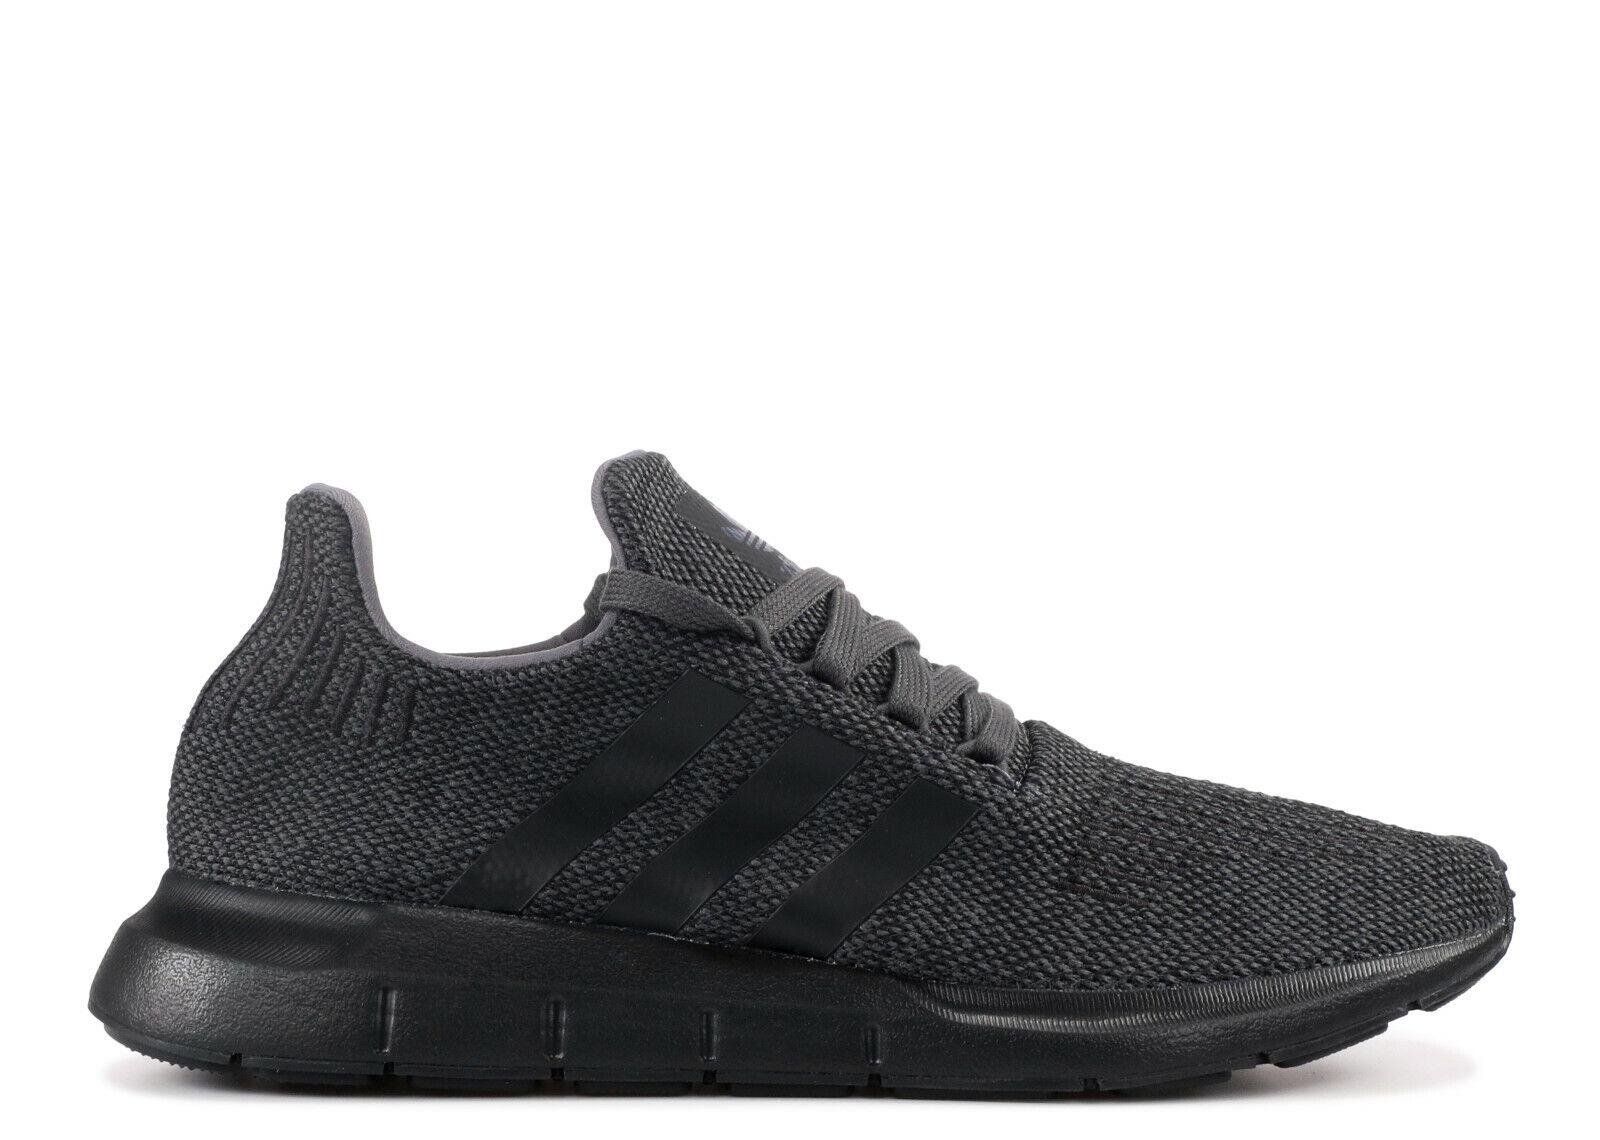 Adidas Swift Run M Running shoes Greystone   Black AC7164  85